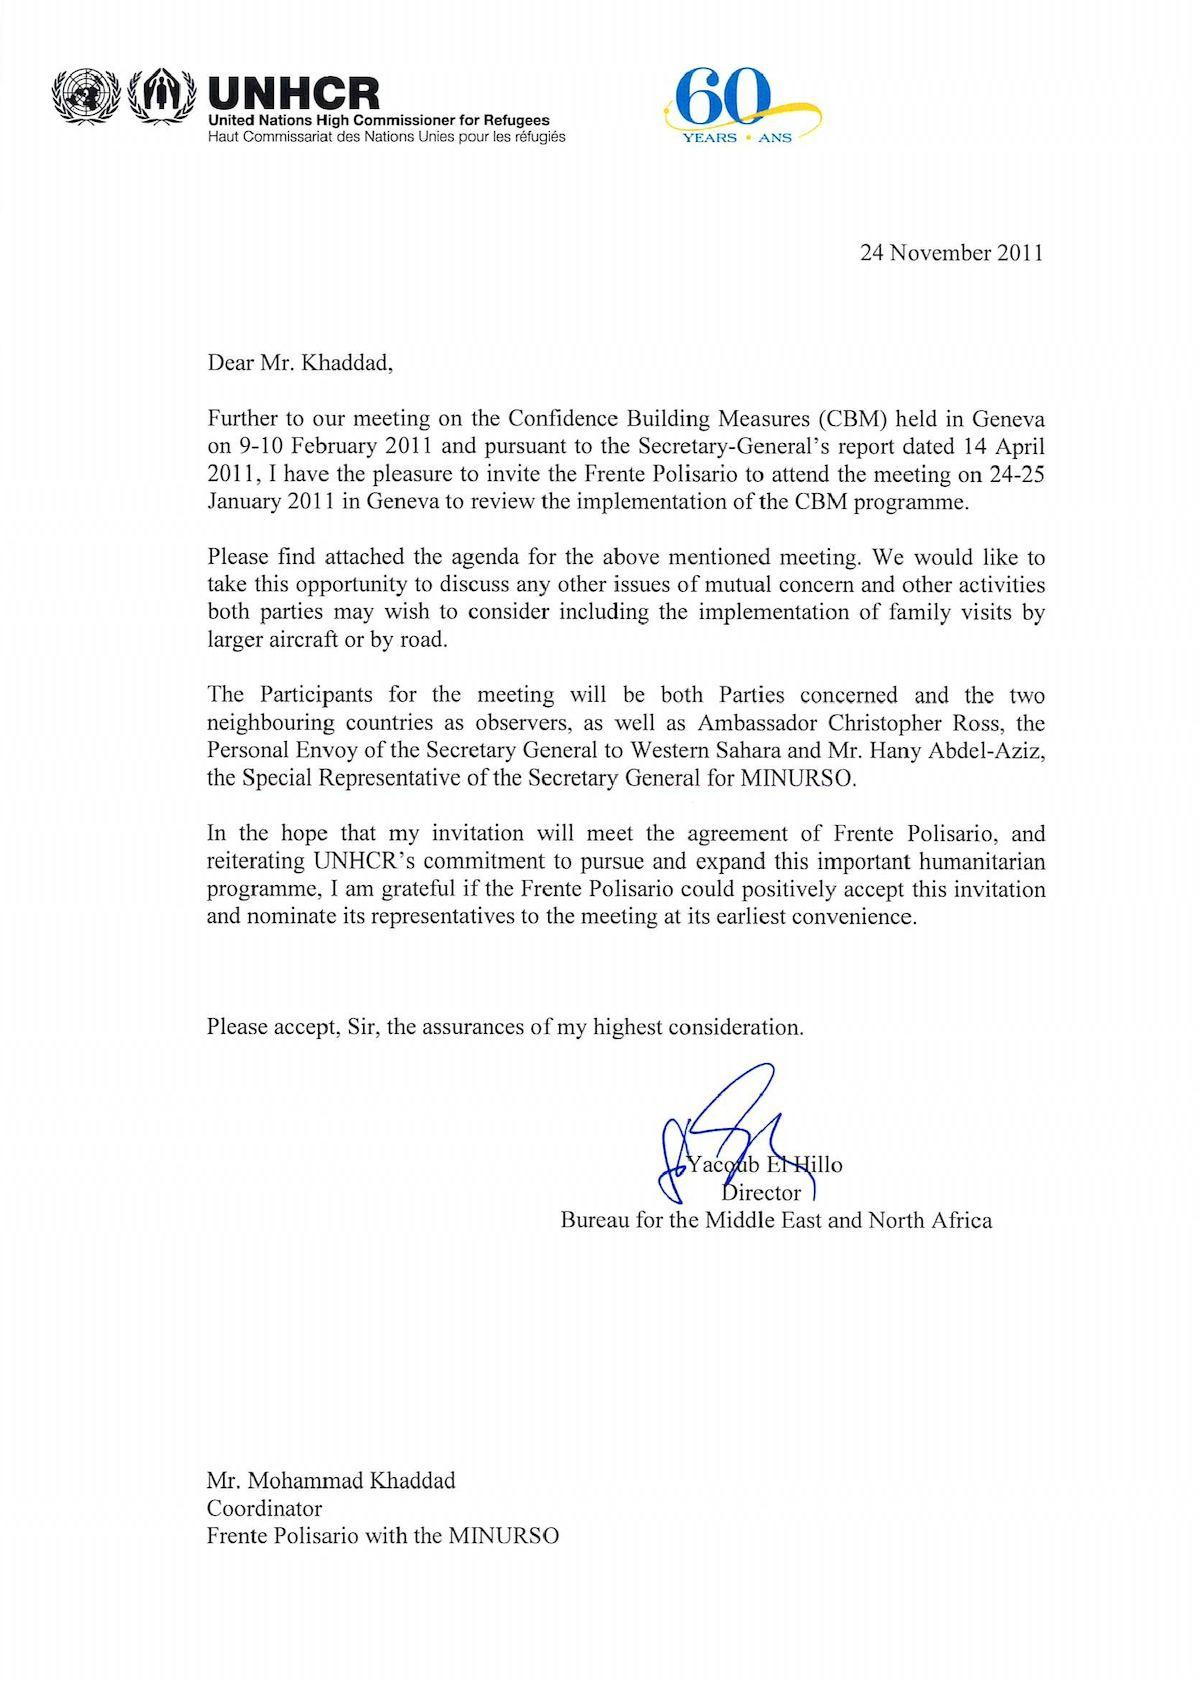 Scanned Letter Polisario With MINURSO CBM(1).